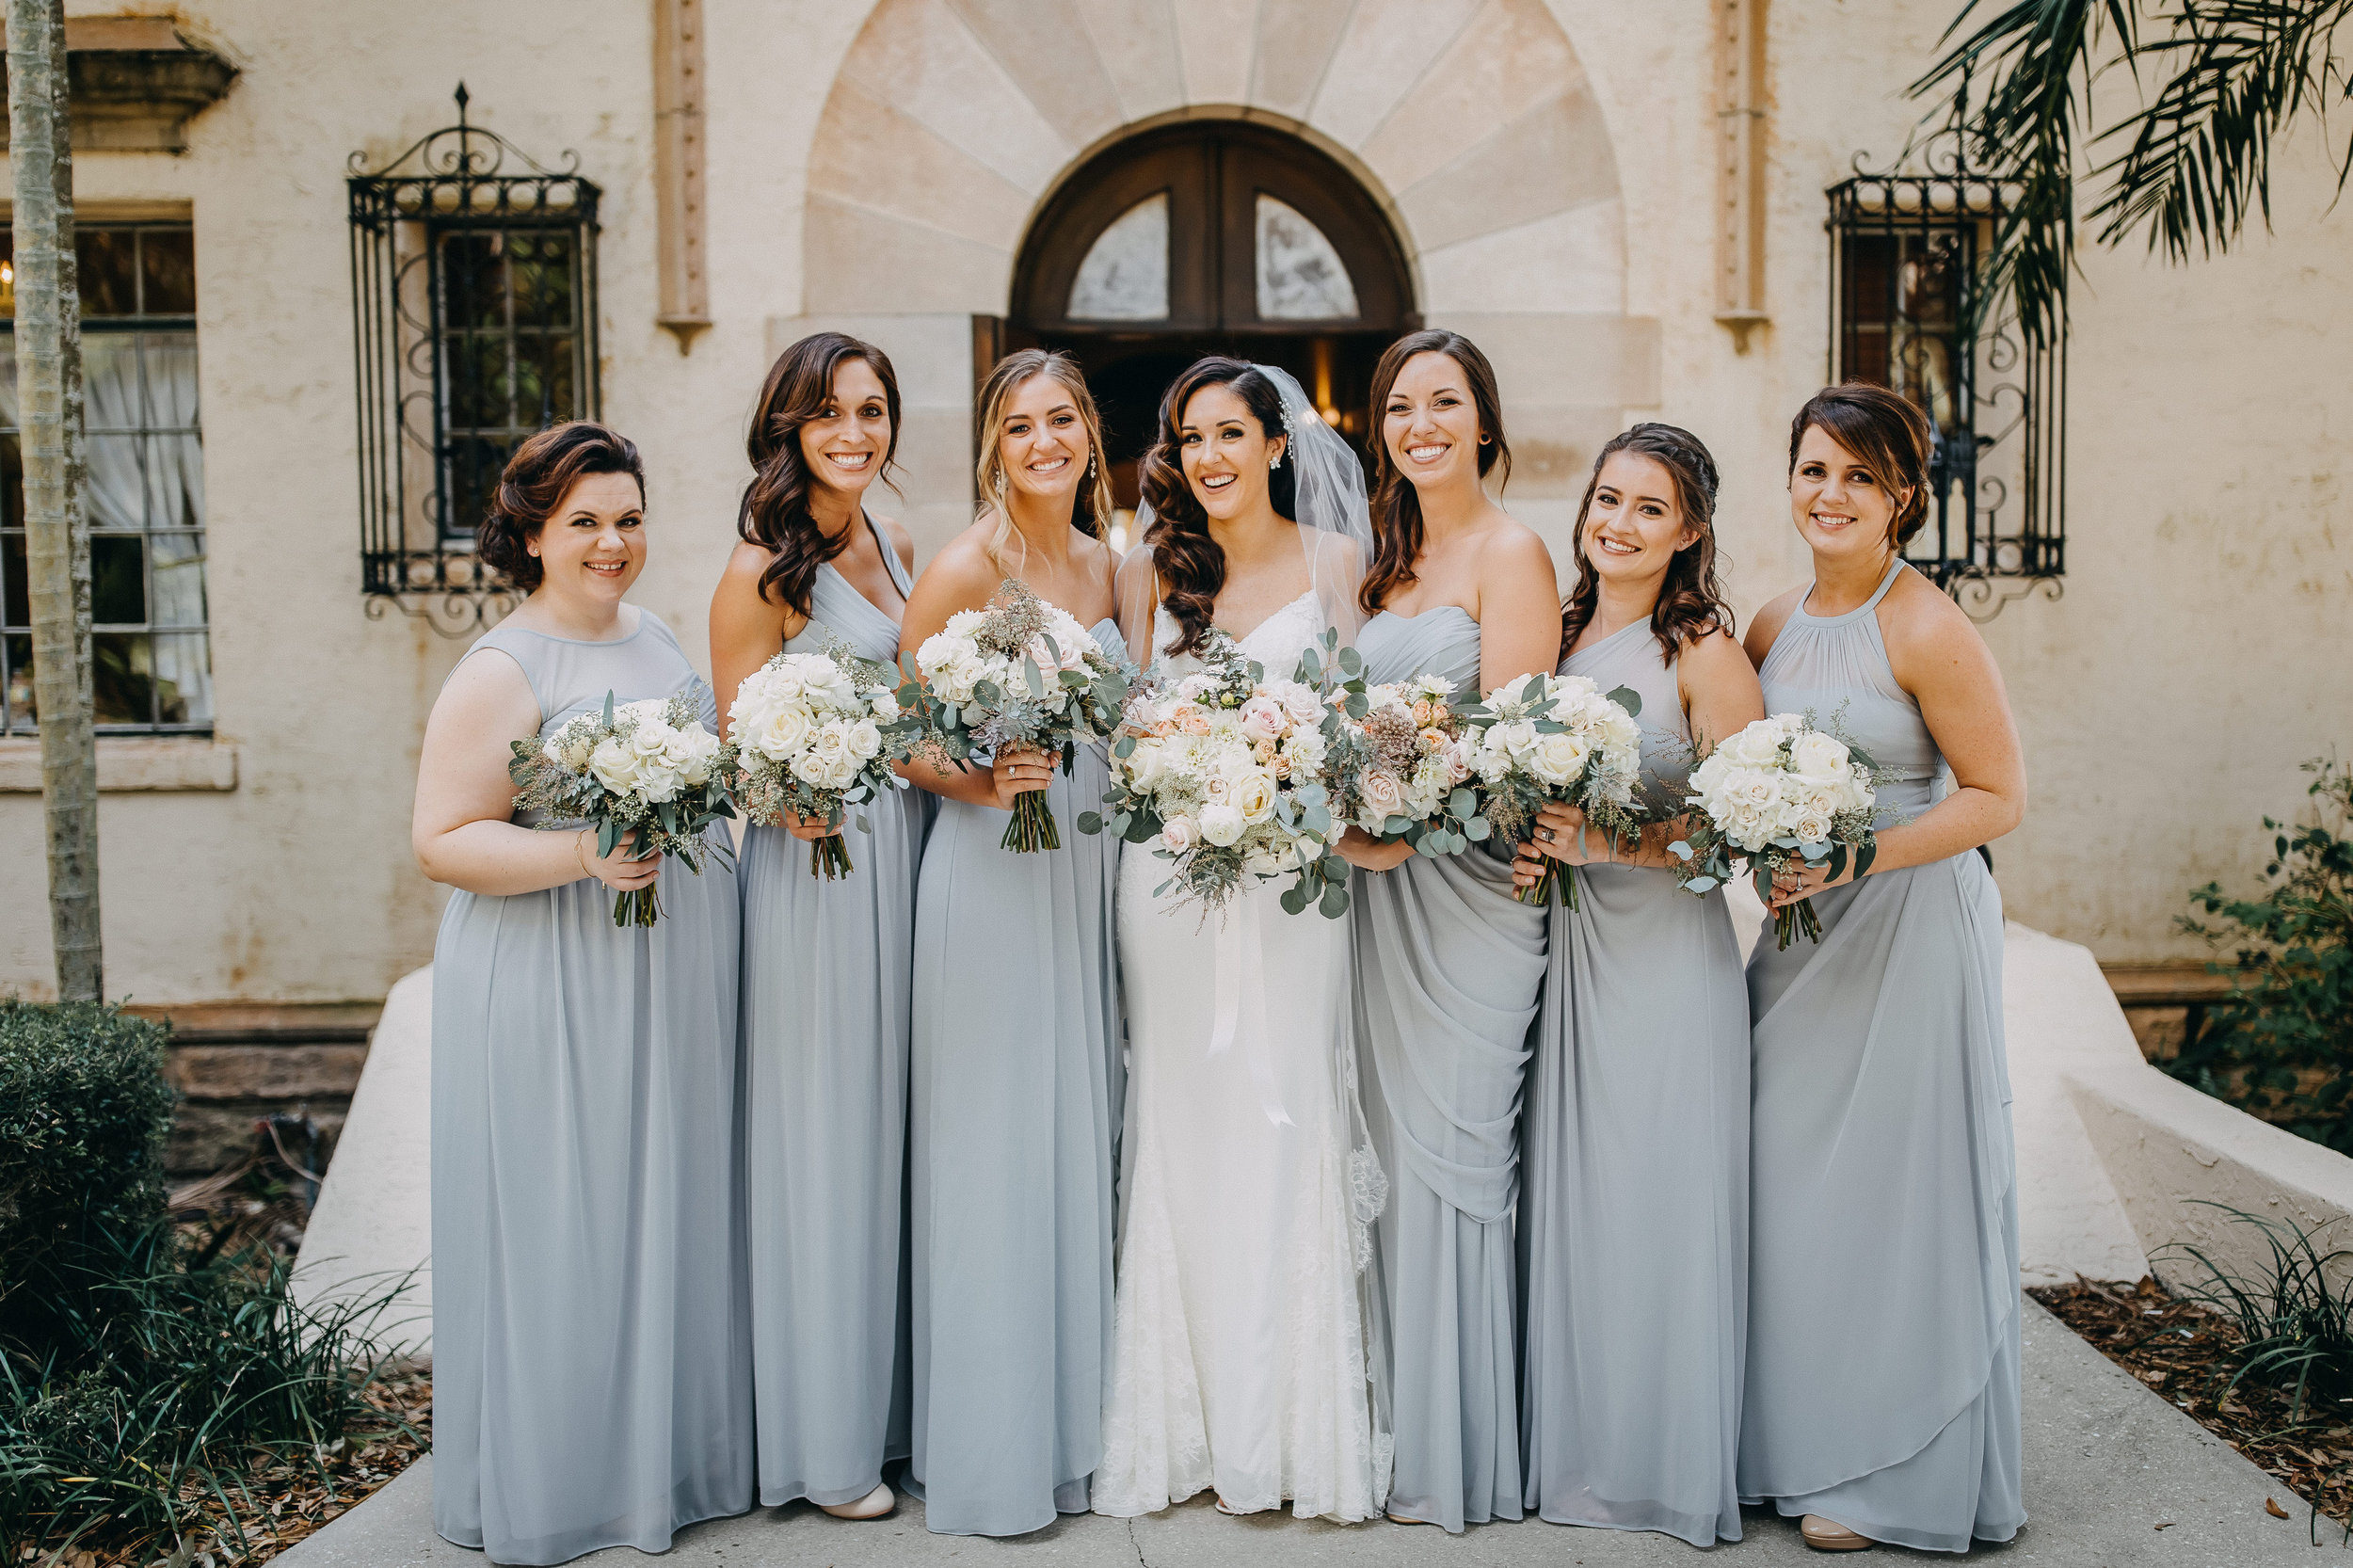 Greyish Blue Bridesmaid Dresses - Florida Estate Wedding - Powel Crowley Estate Wedding